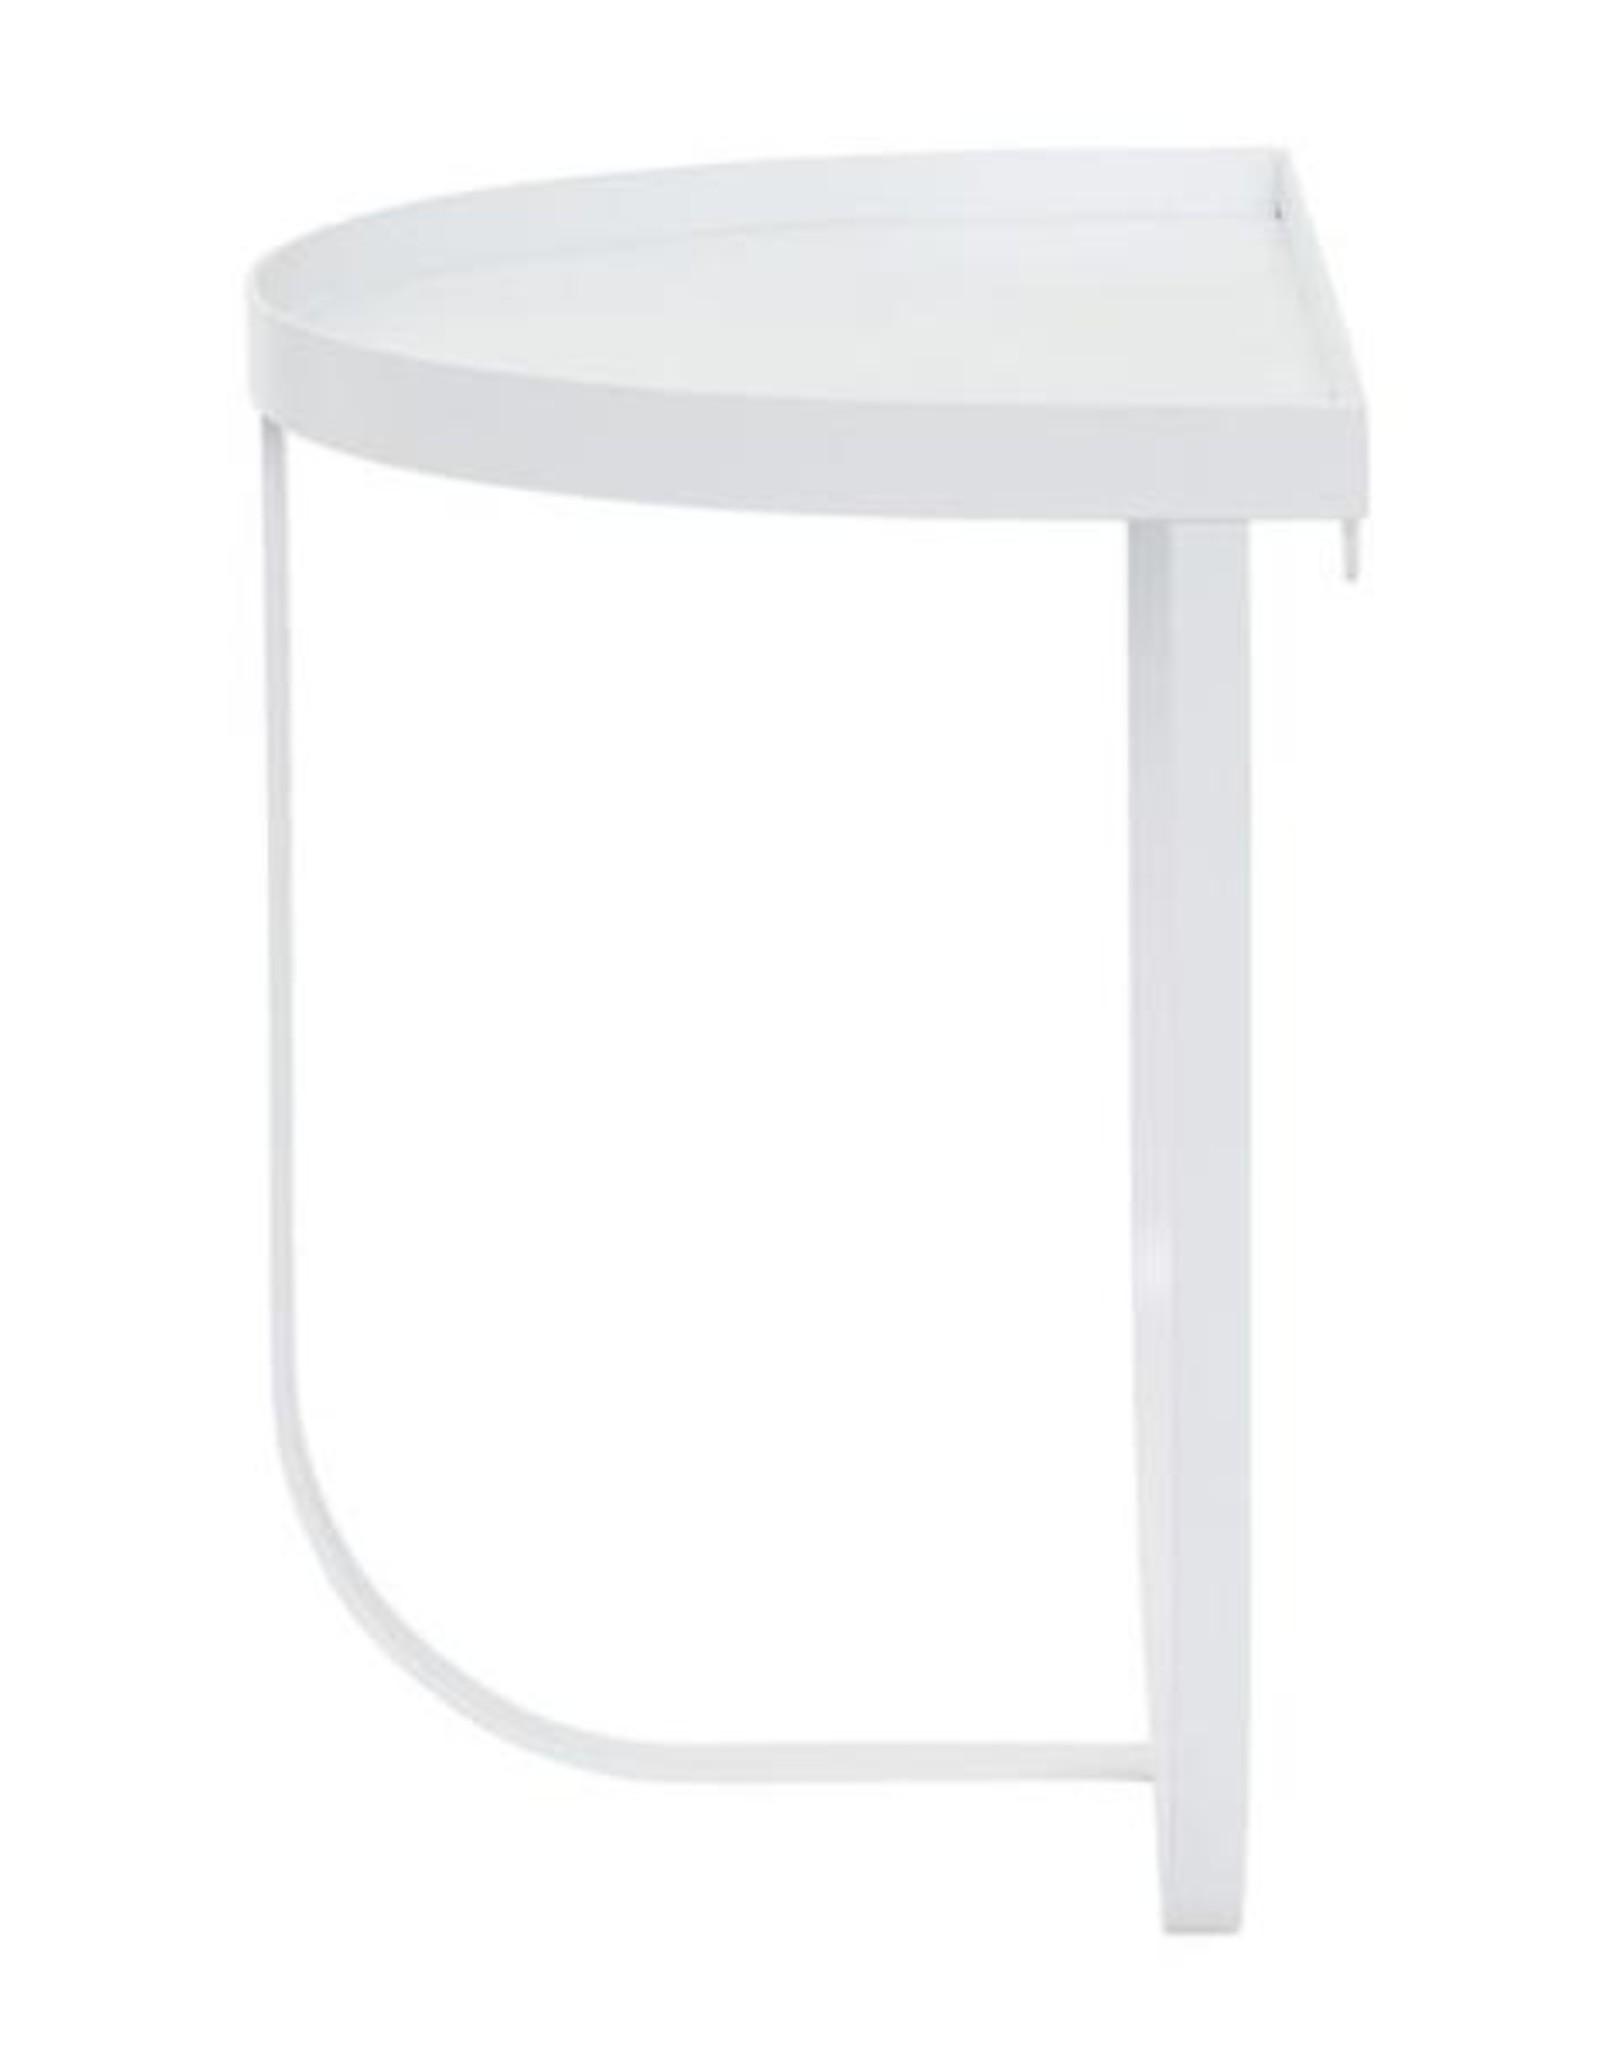 Bloomingville Bloomingville - Harper bedside table, white table